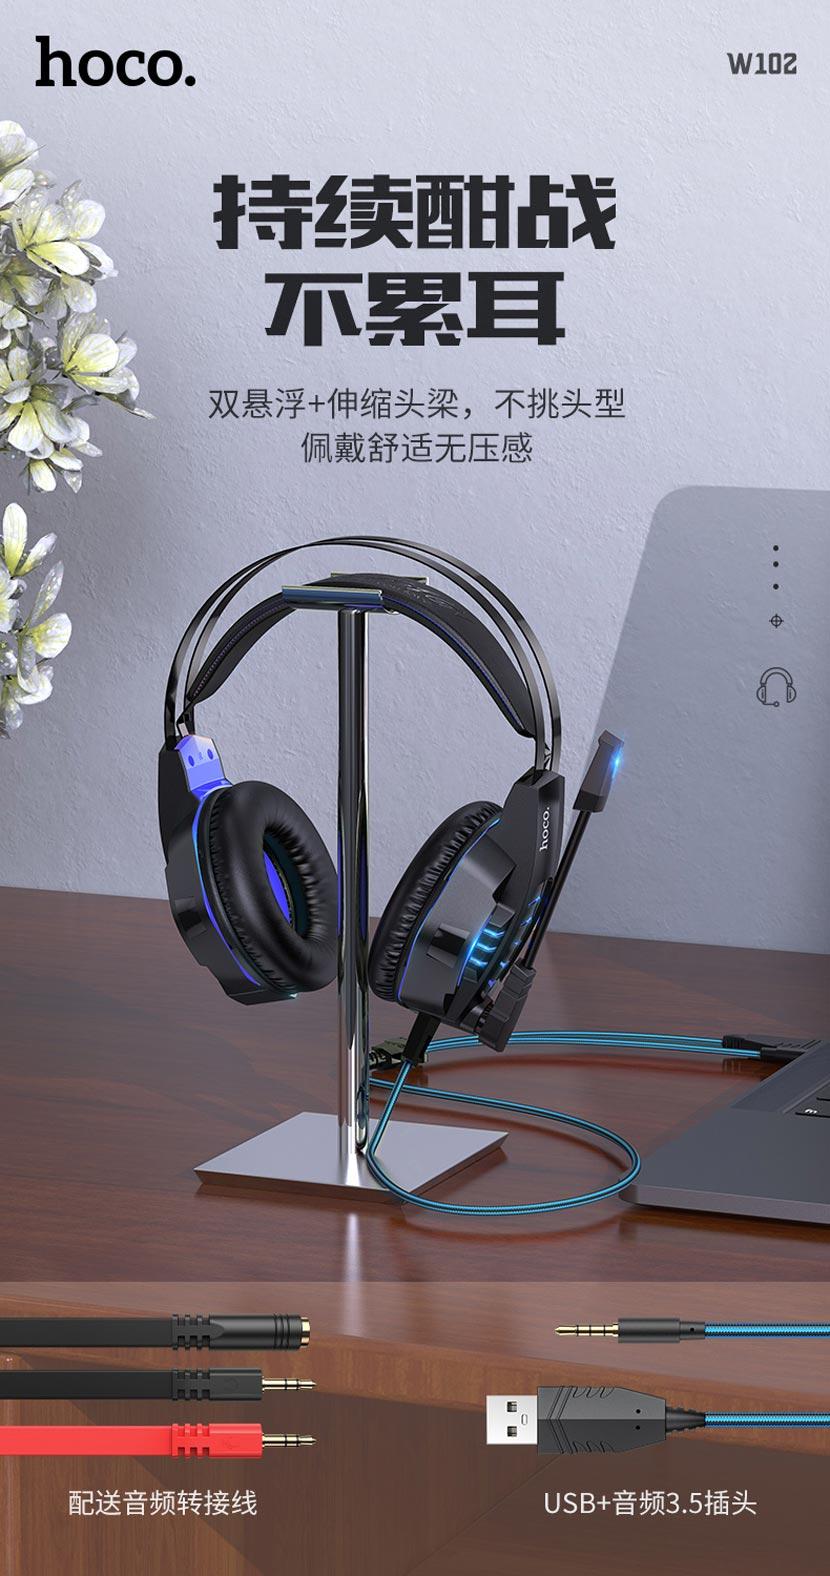 hoco news w102 cool tour gaming headphones comfortable cn